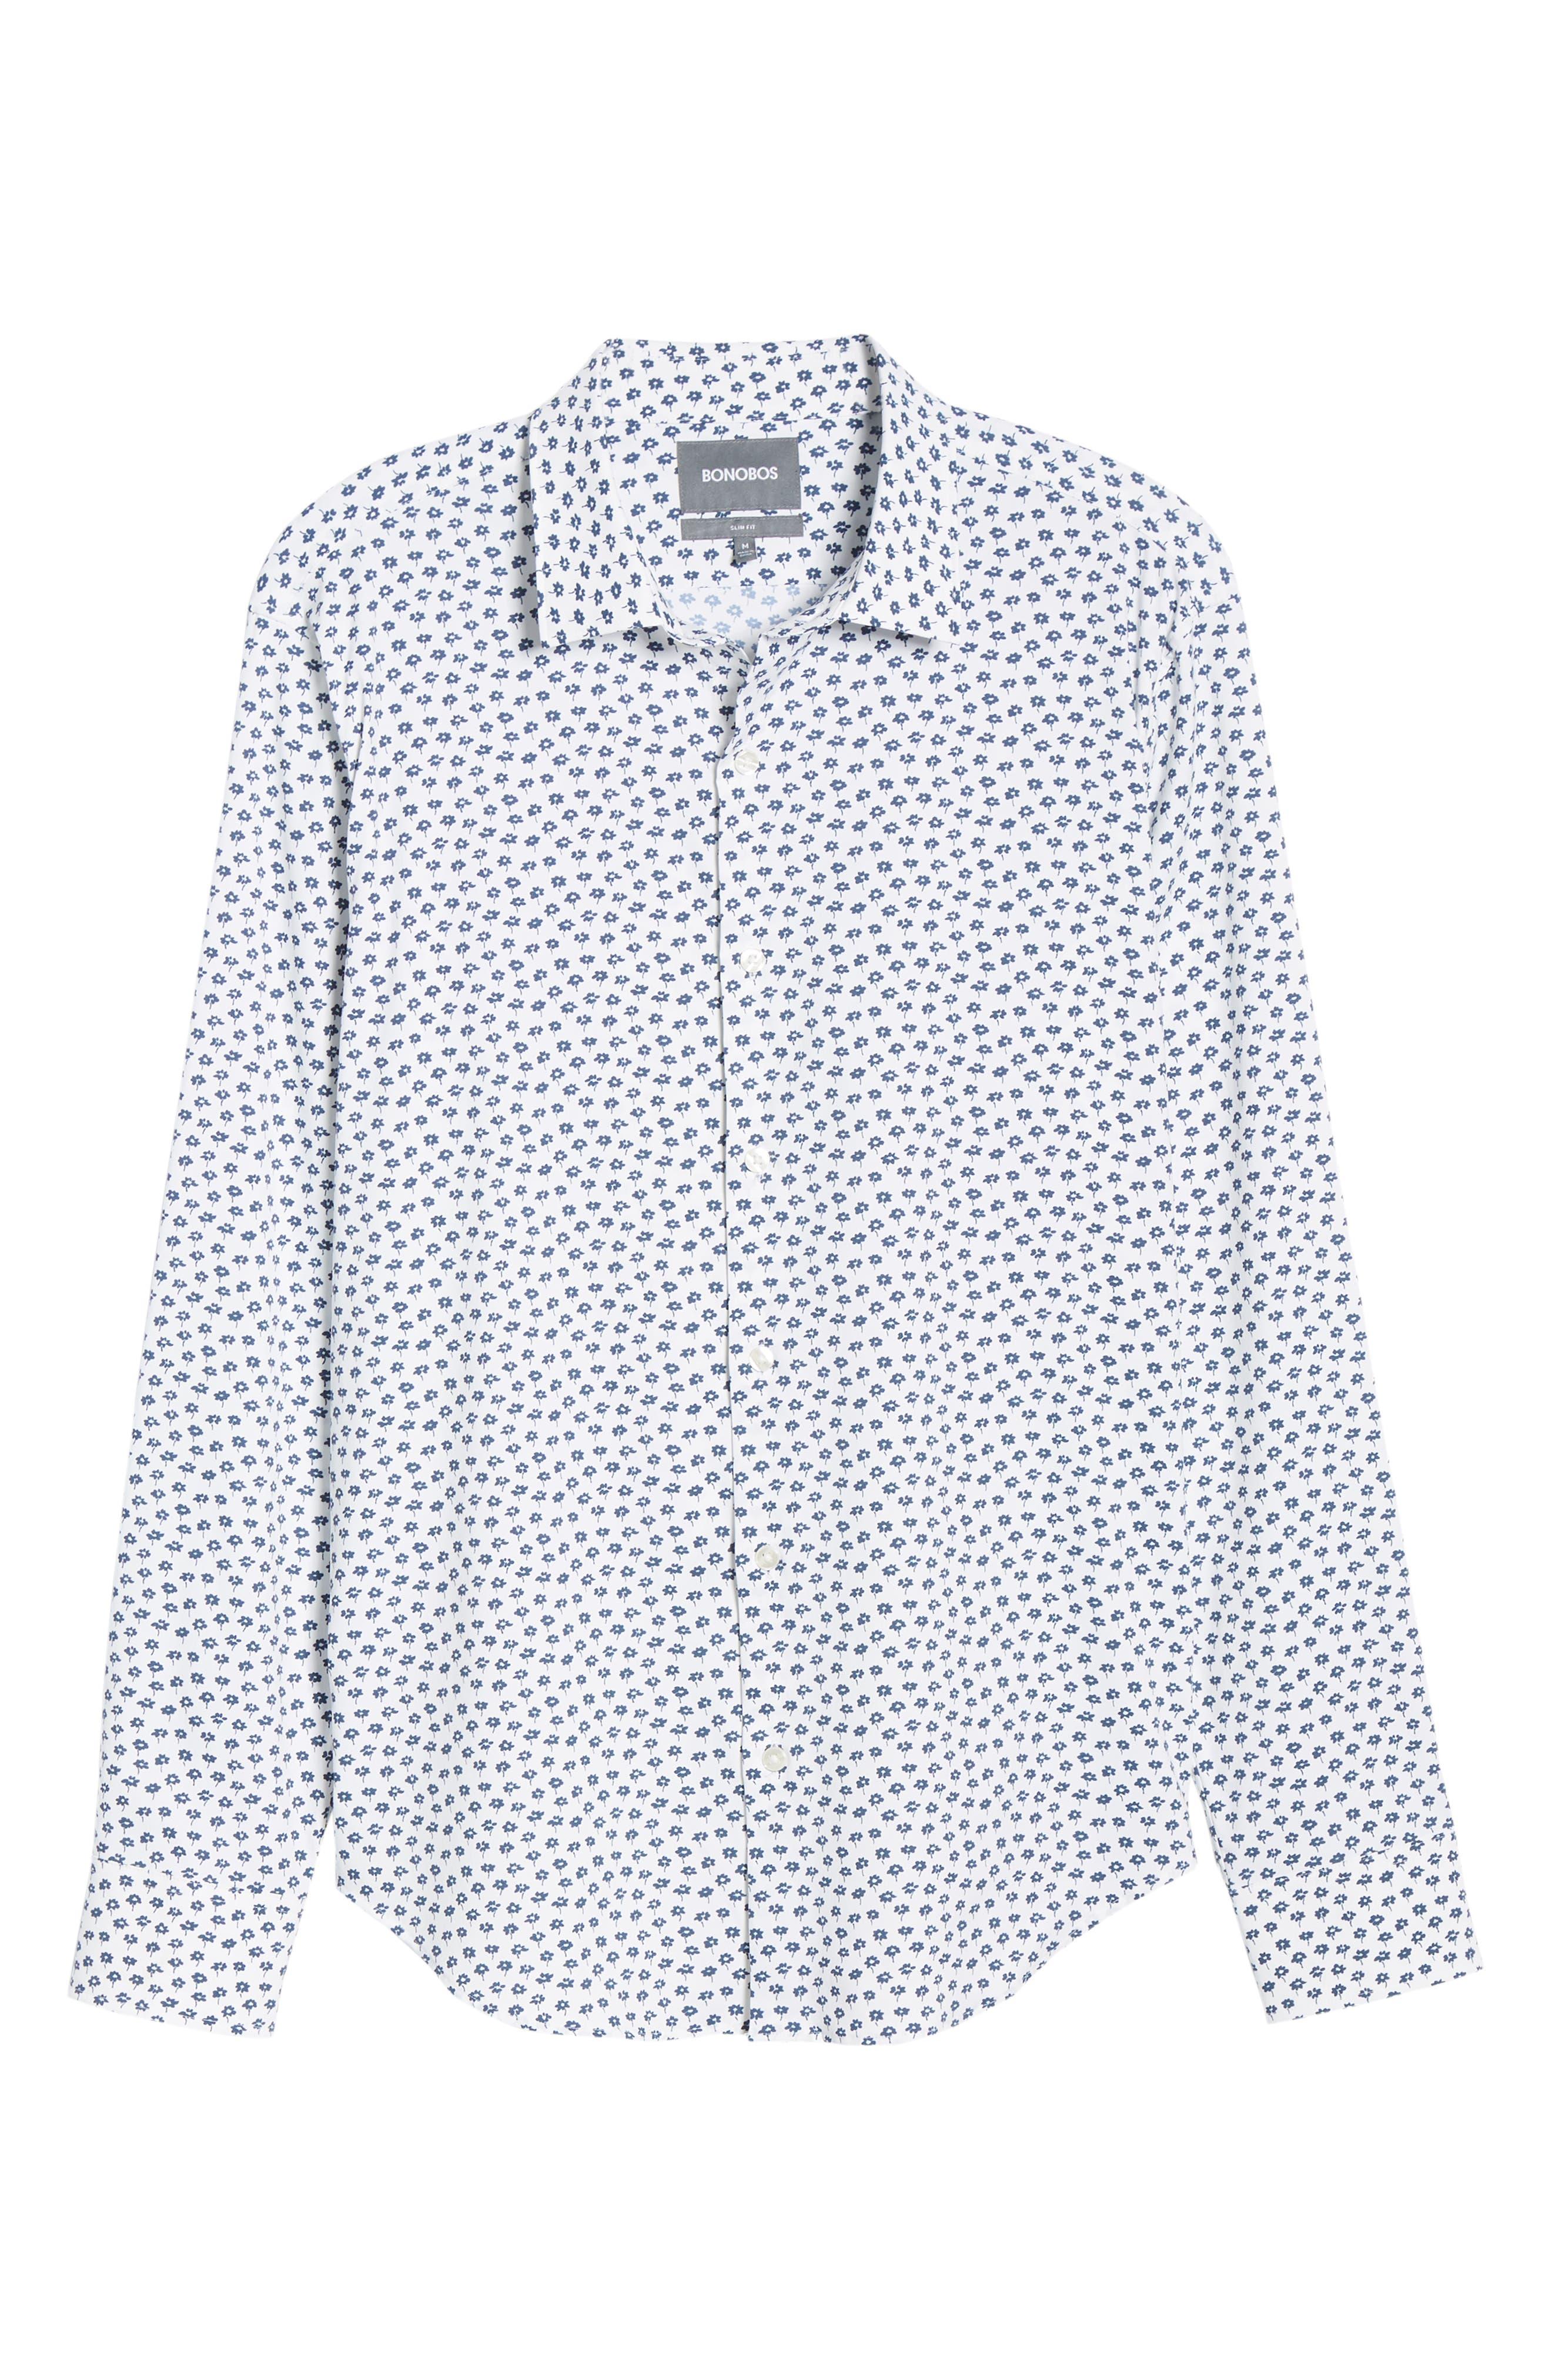 Slim Fit Floral Tech Sport Shirt,                             Alternate thumbnail 5, color,                             FLORAL STAMP - PEACOCK